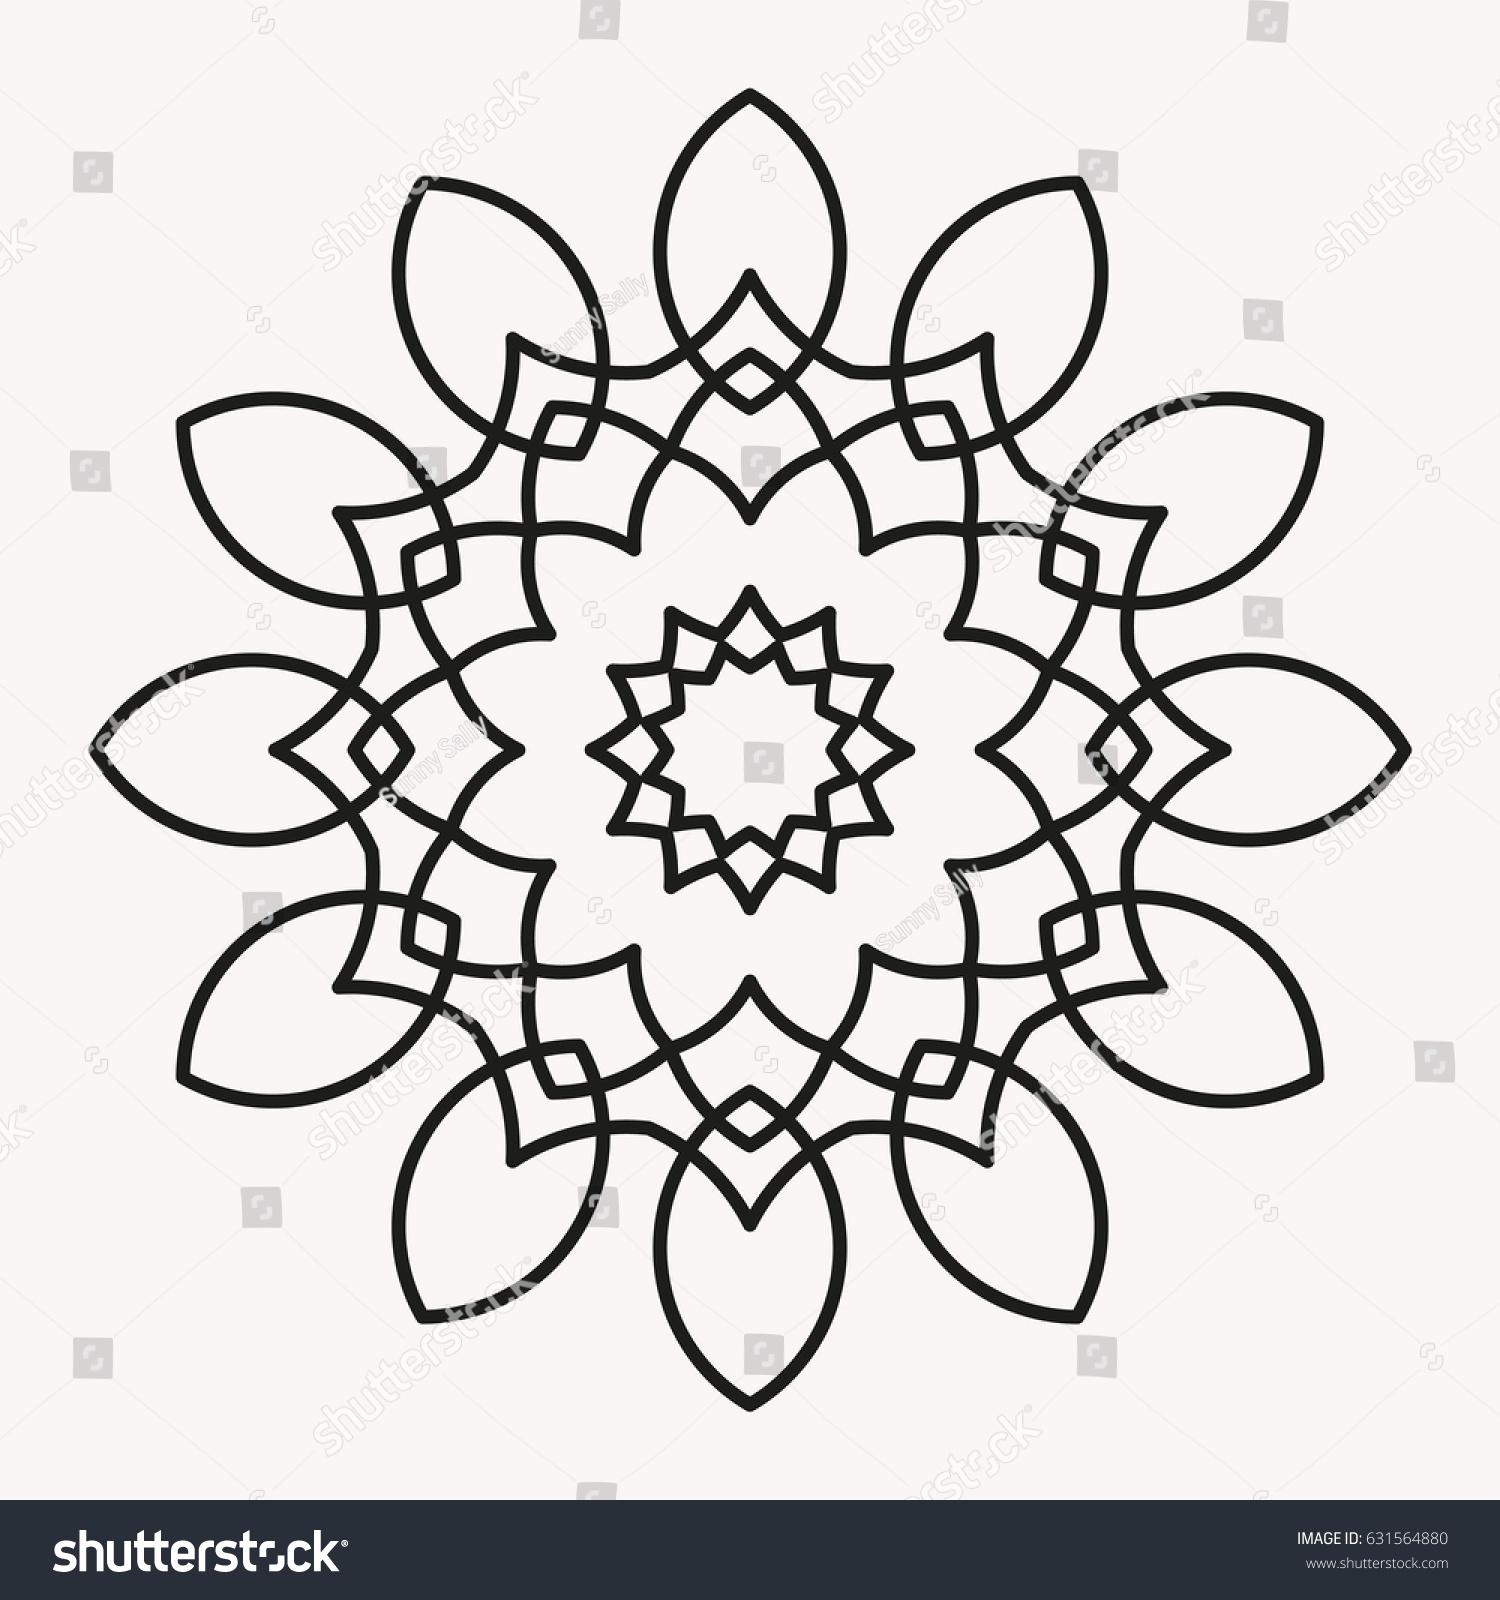 Simple Mandala Shape For Coloring Vector Floral Flower